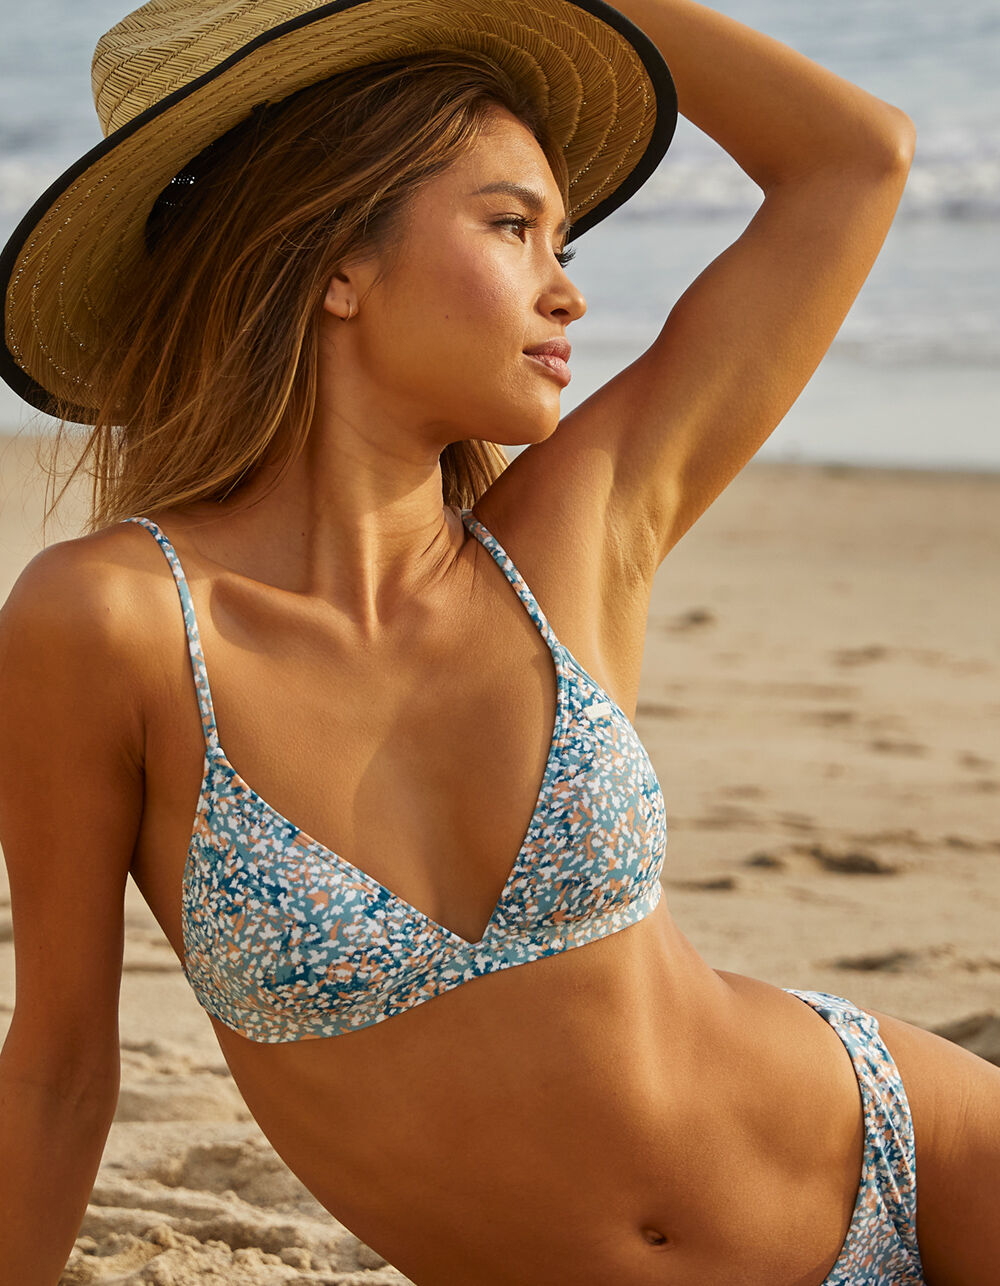 ROXY Printed Beach Classics Fixed Triangle Bikini Top